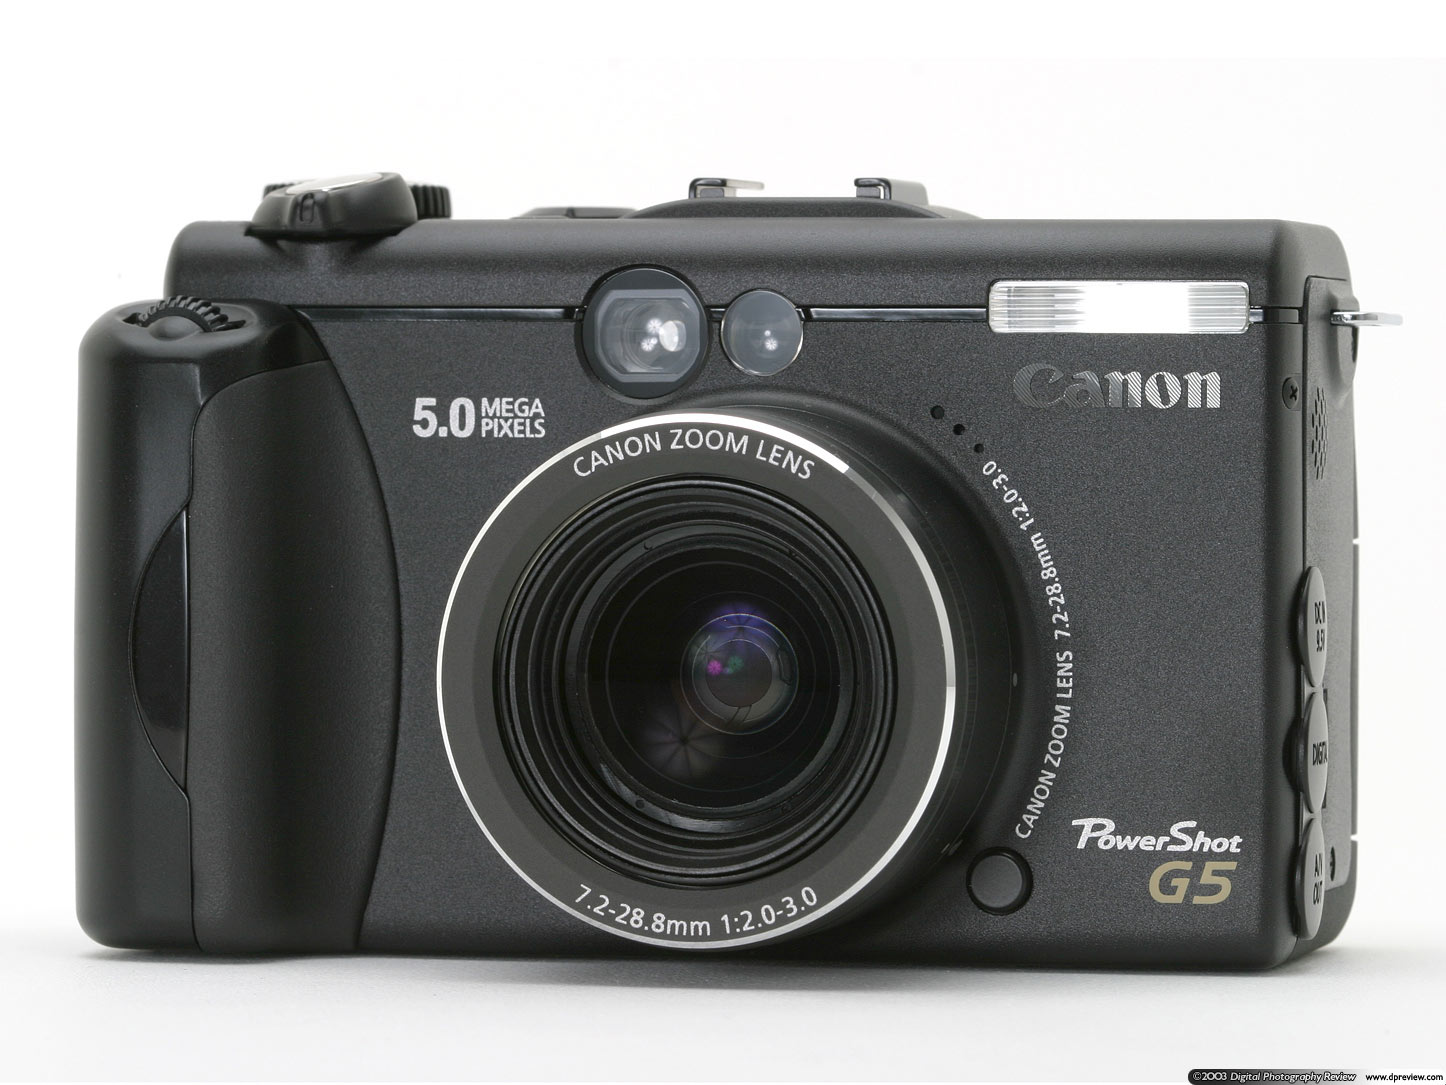 Canon Powershot G5 Digital Camera Memory Card 2GB CompactFlash ...